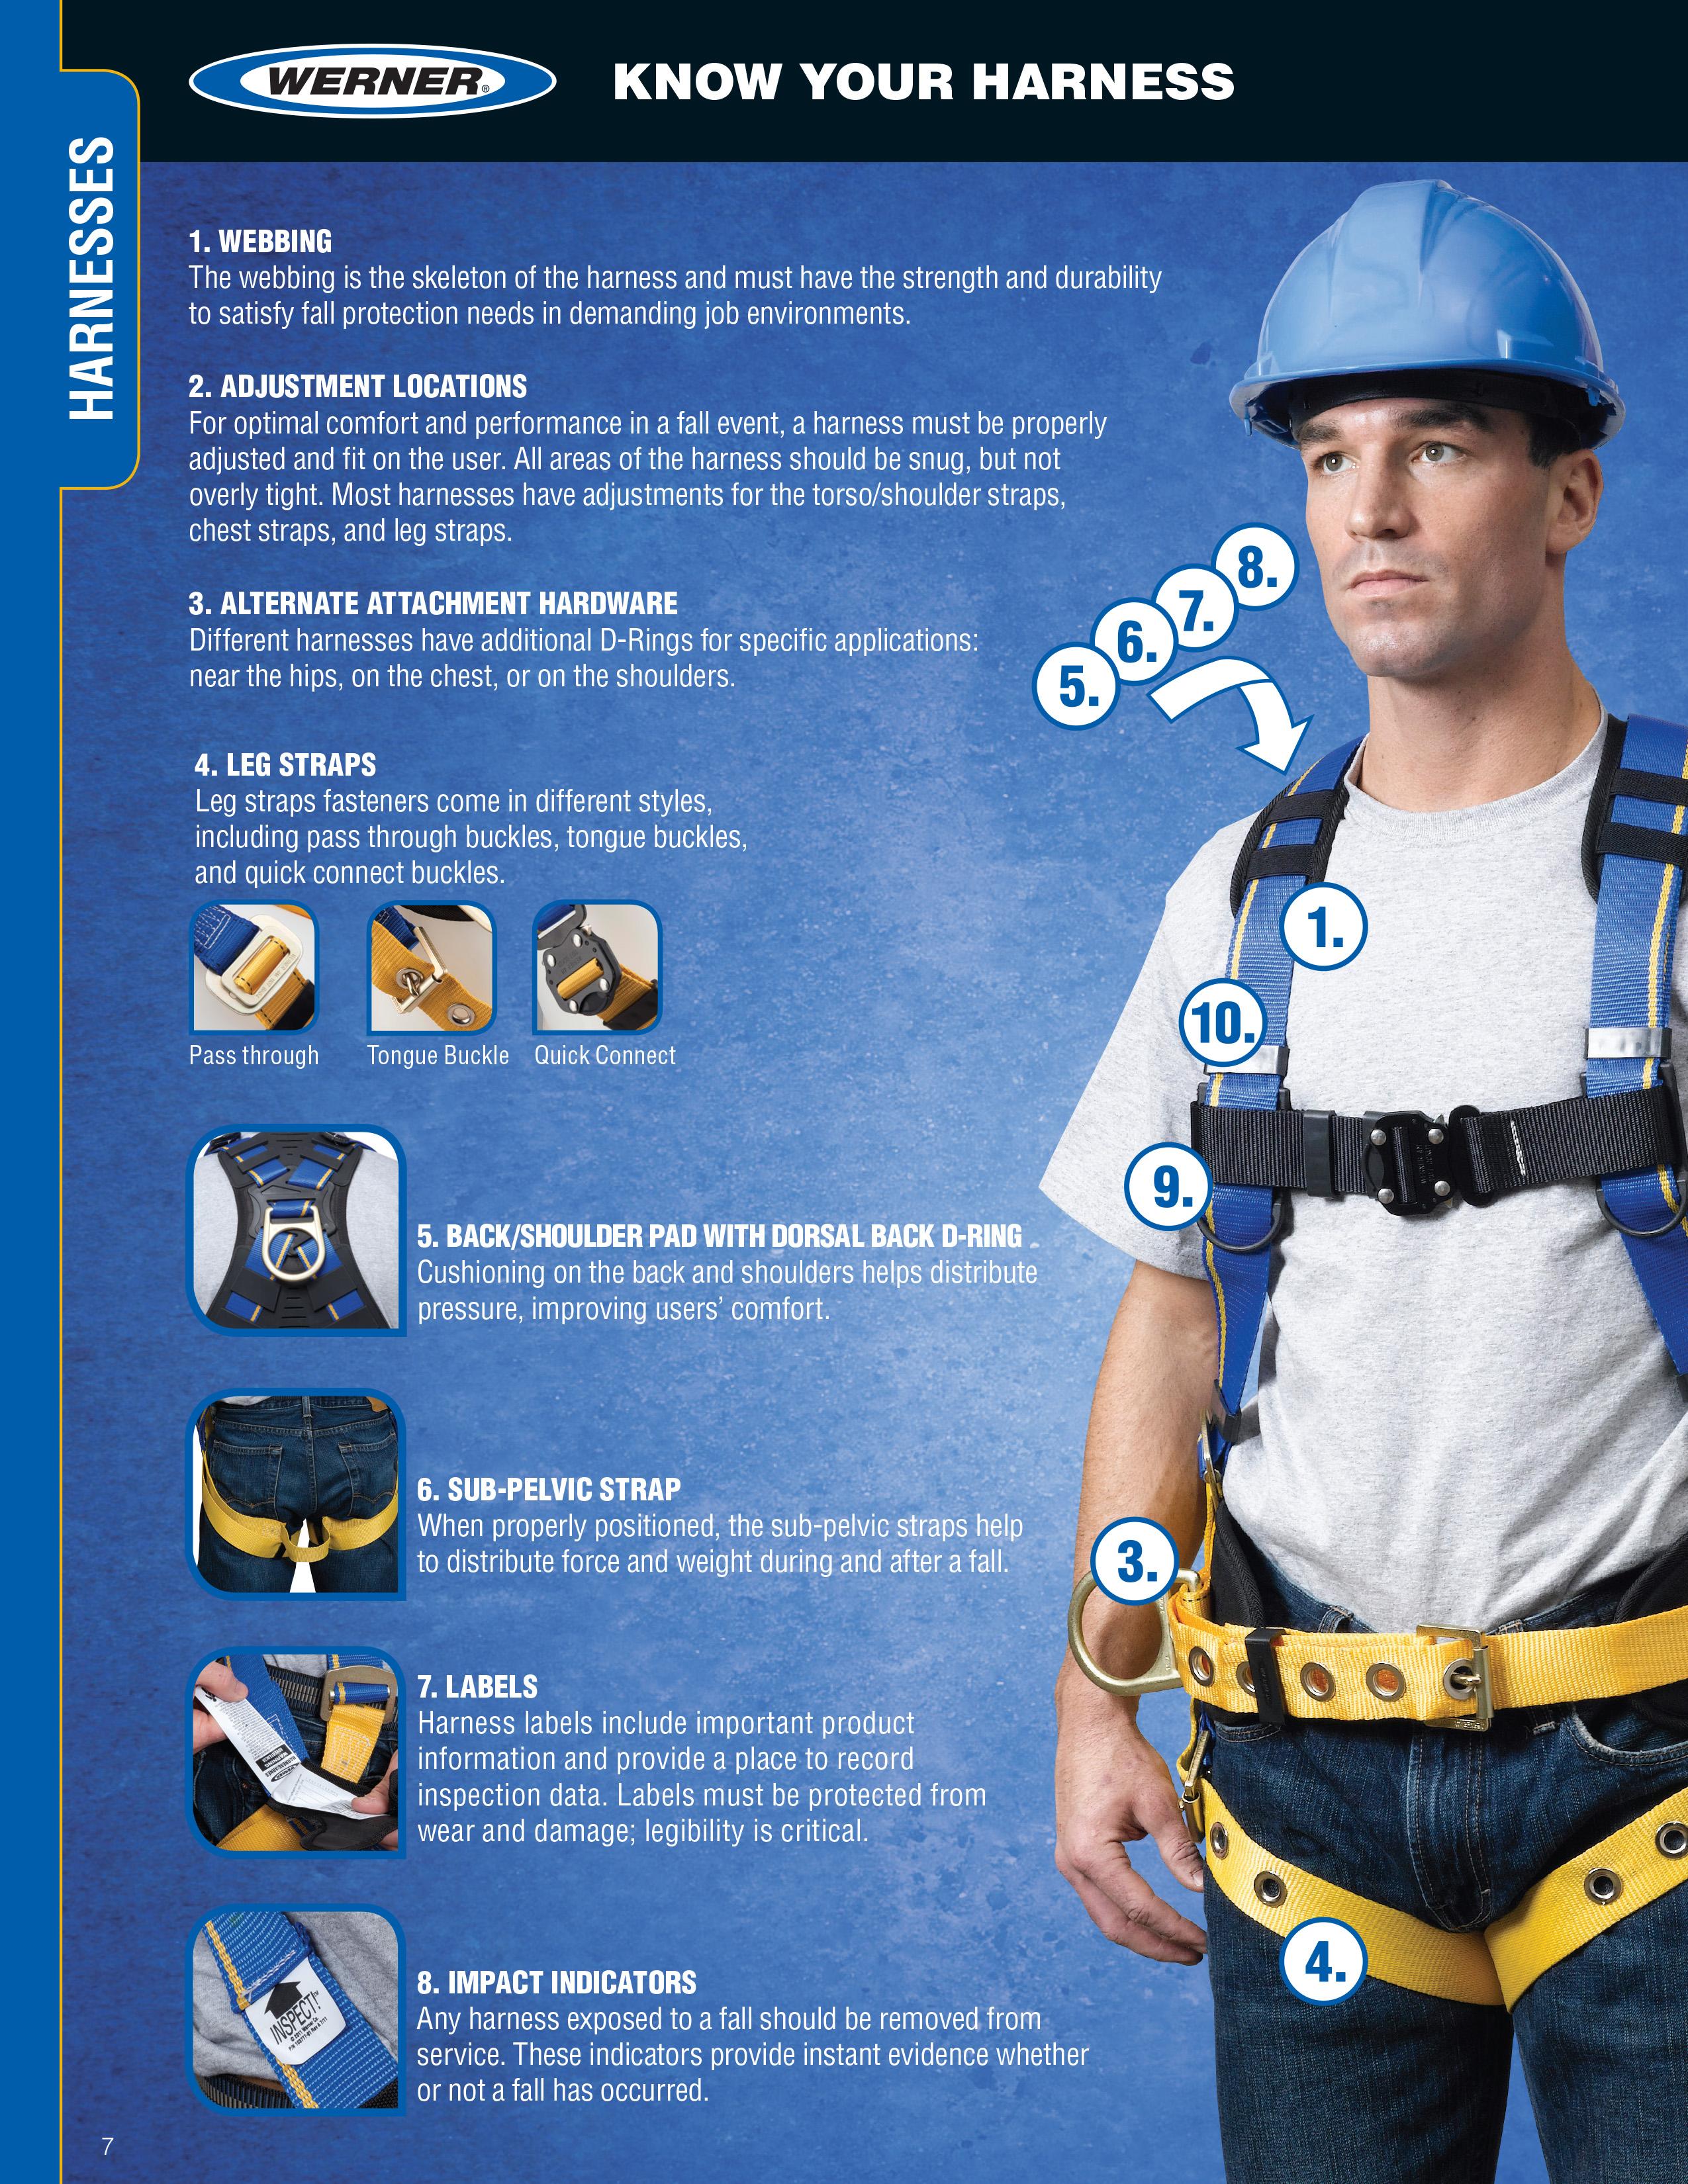 c250-harness-a.jpg